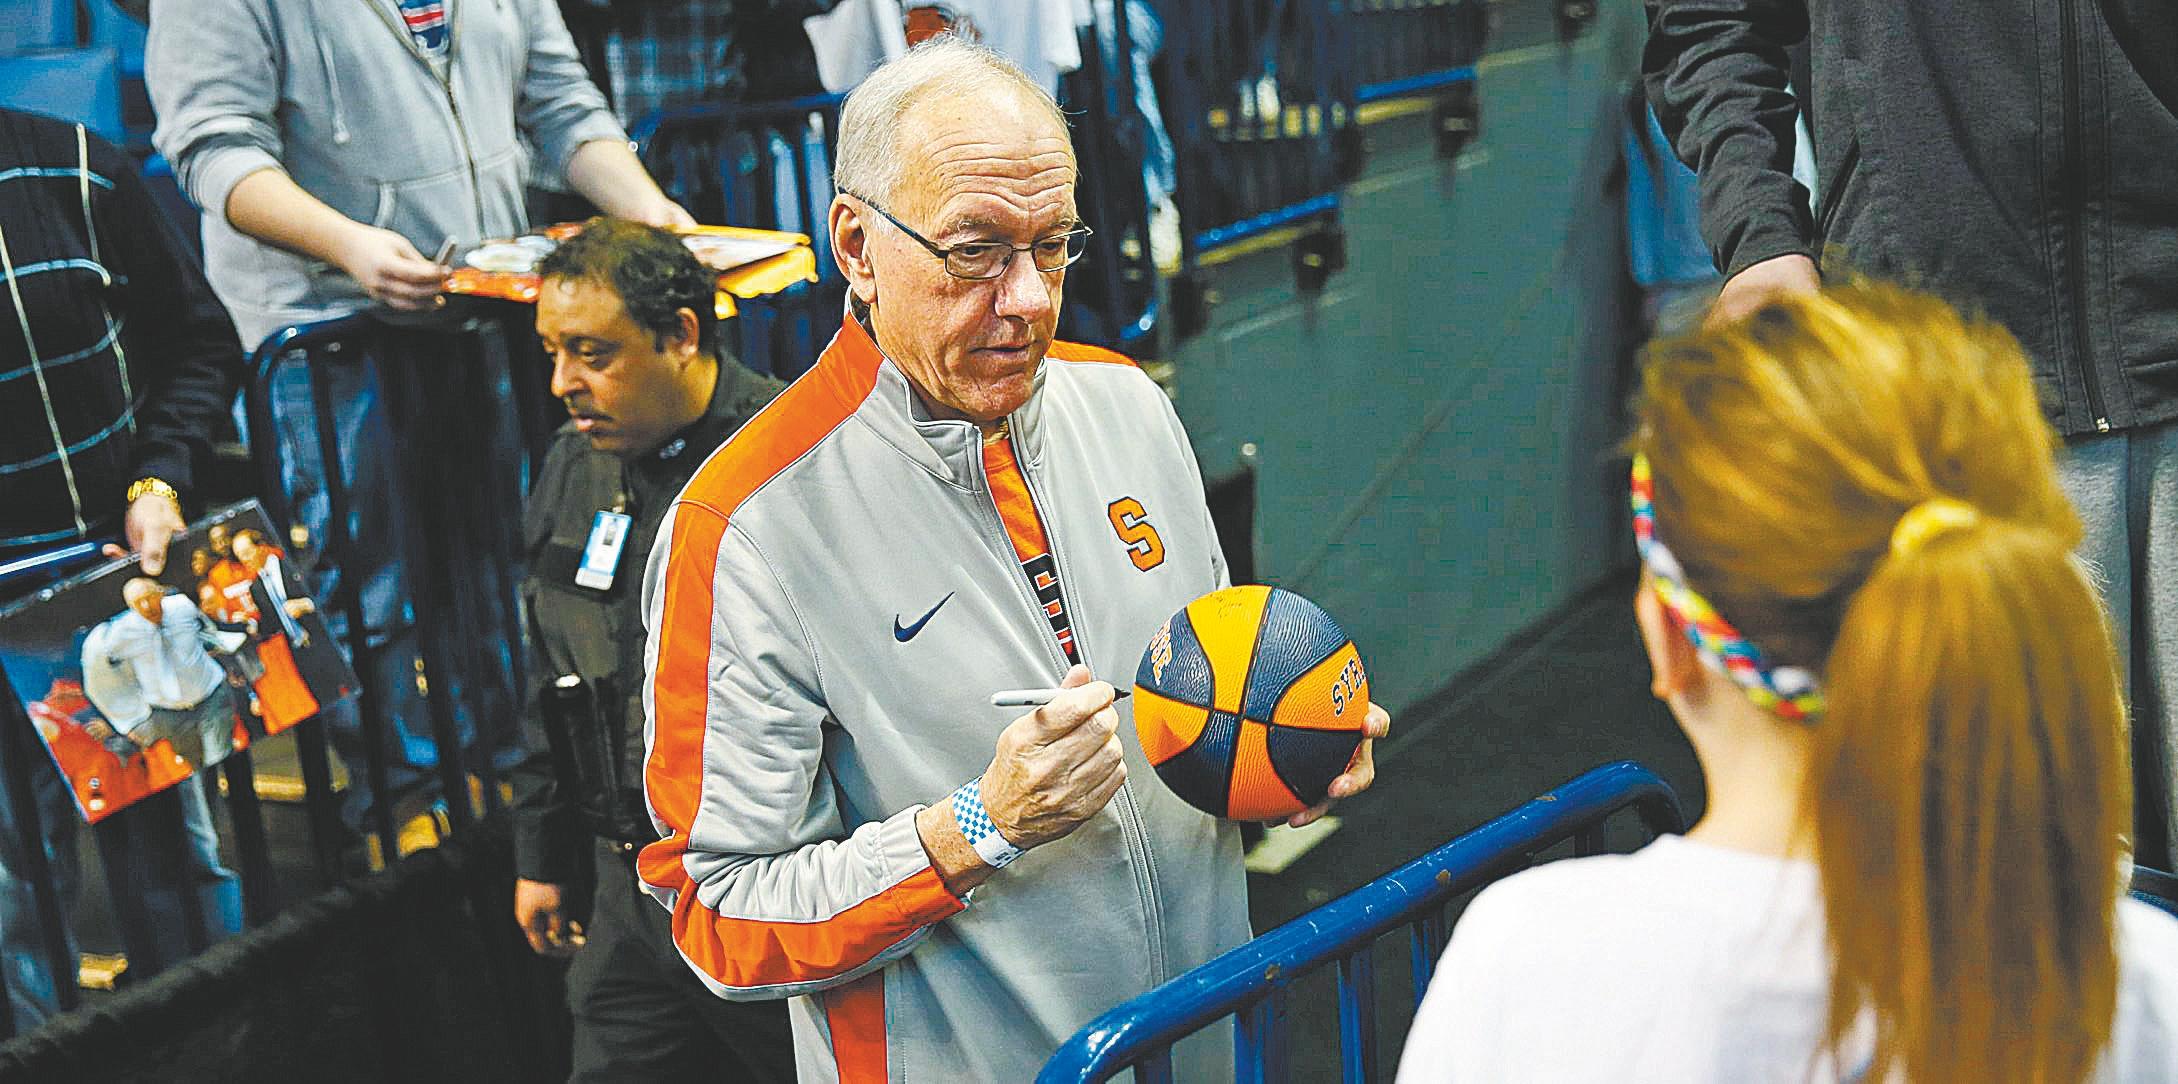 Syracuse coach Jim Boeheim signs autographs during Wednesday's practice. (Derek Gee/Buffalo News)